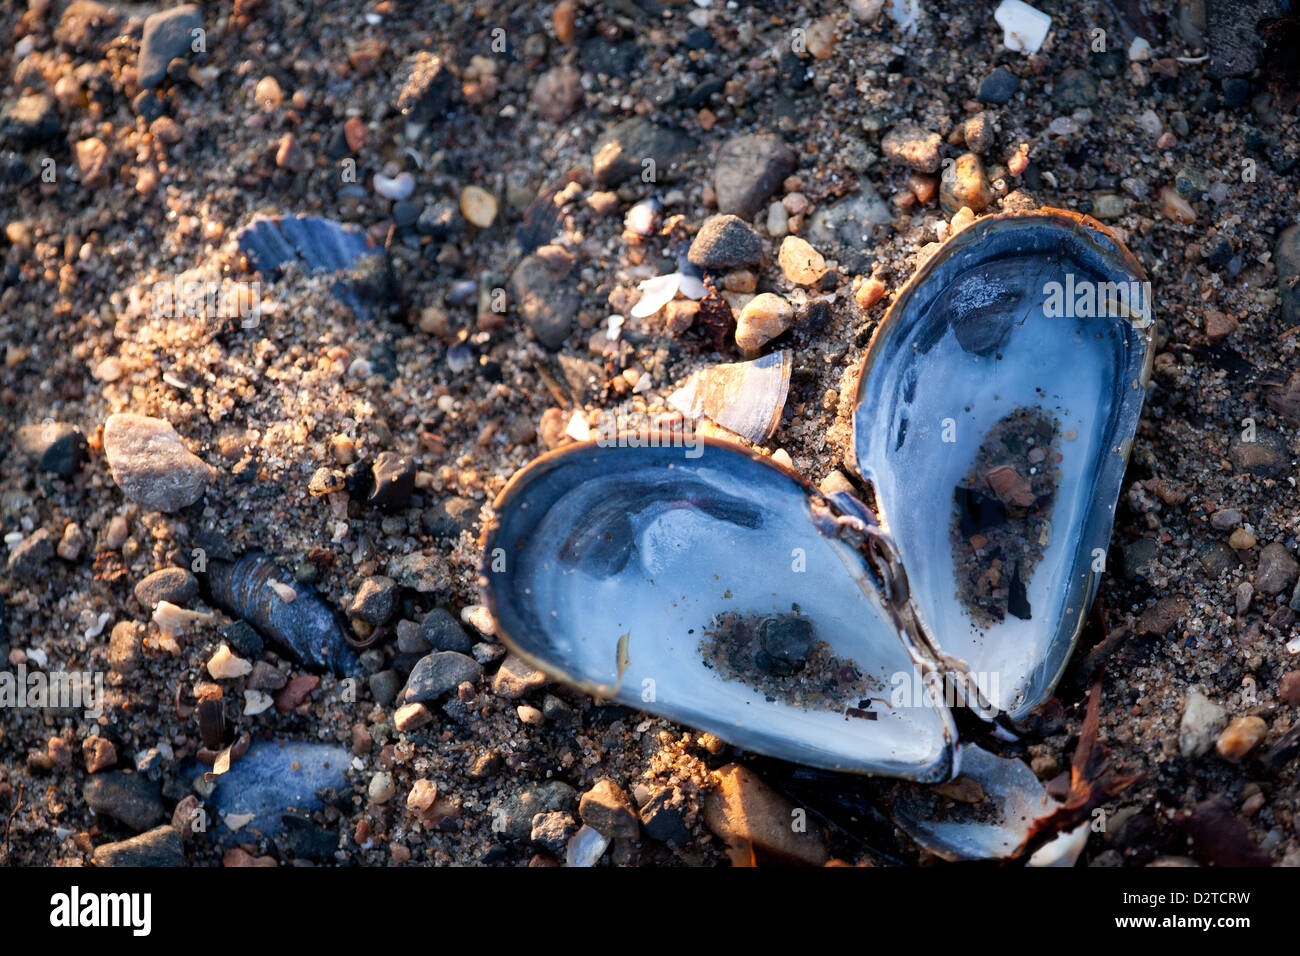 Blue mussel, Mytilus edulis, by the Oslofjord at Larkollen in Rygge kommune, Østfold fylke, Norway. - Stock Image